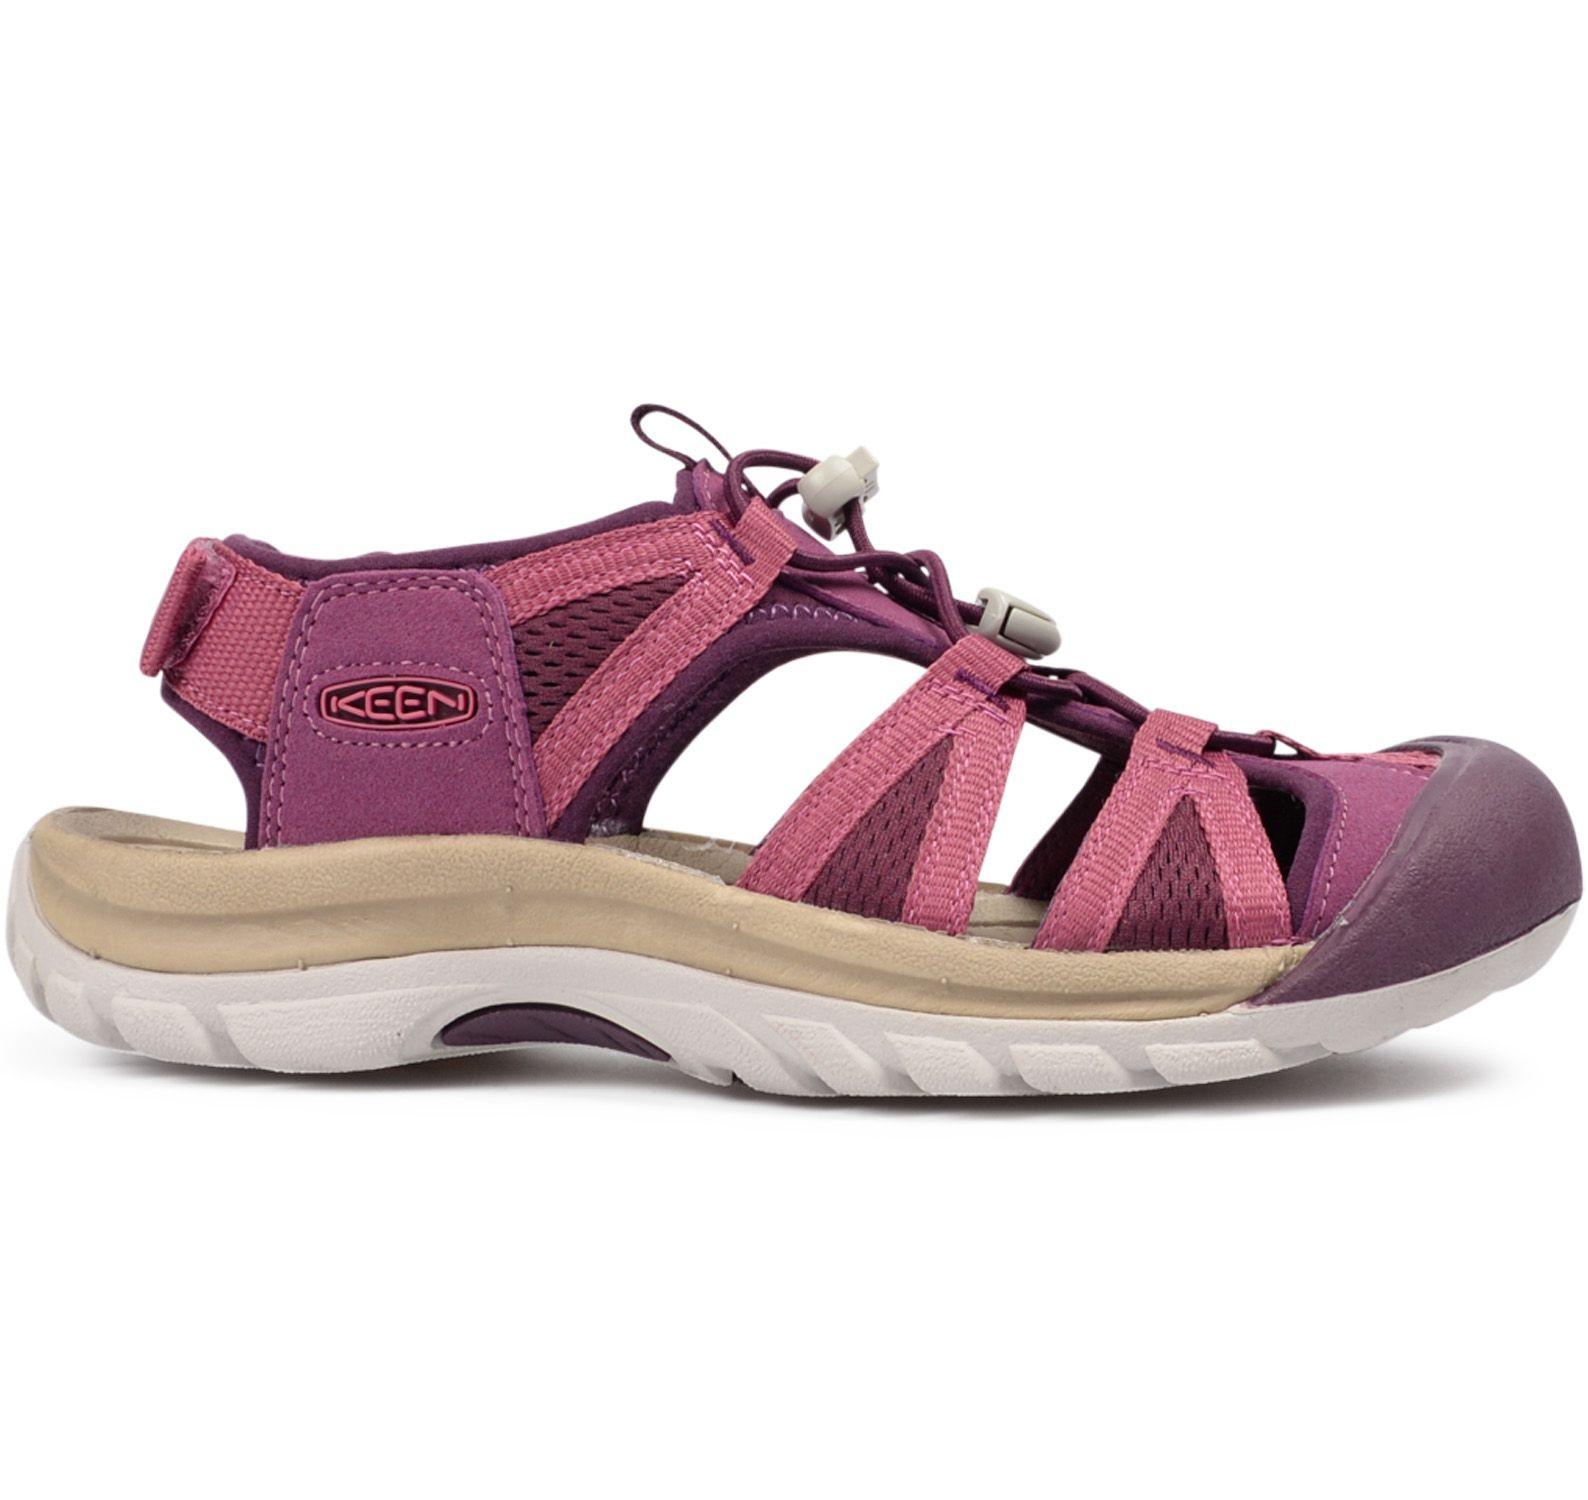 venice ii h2, grape kiss/red violet, 35